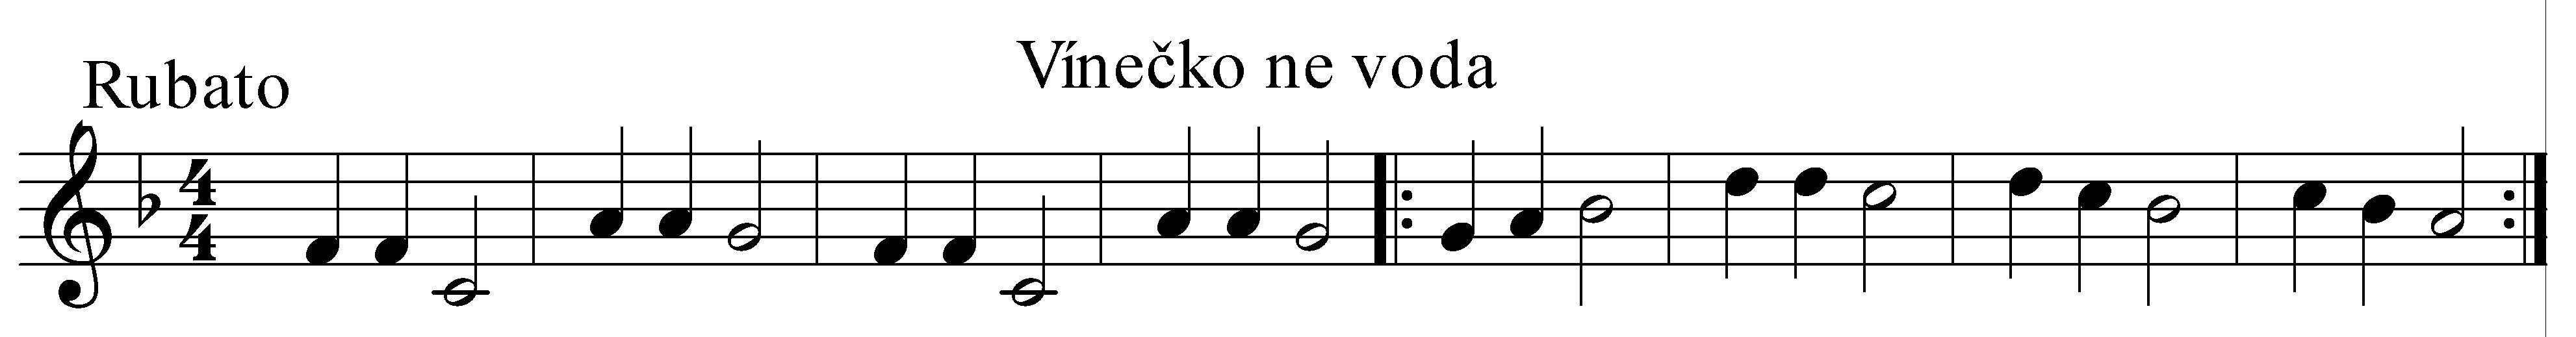 cimbálová muzika - vinecko ne voda